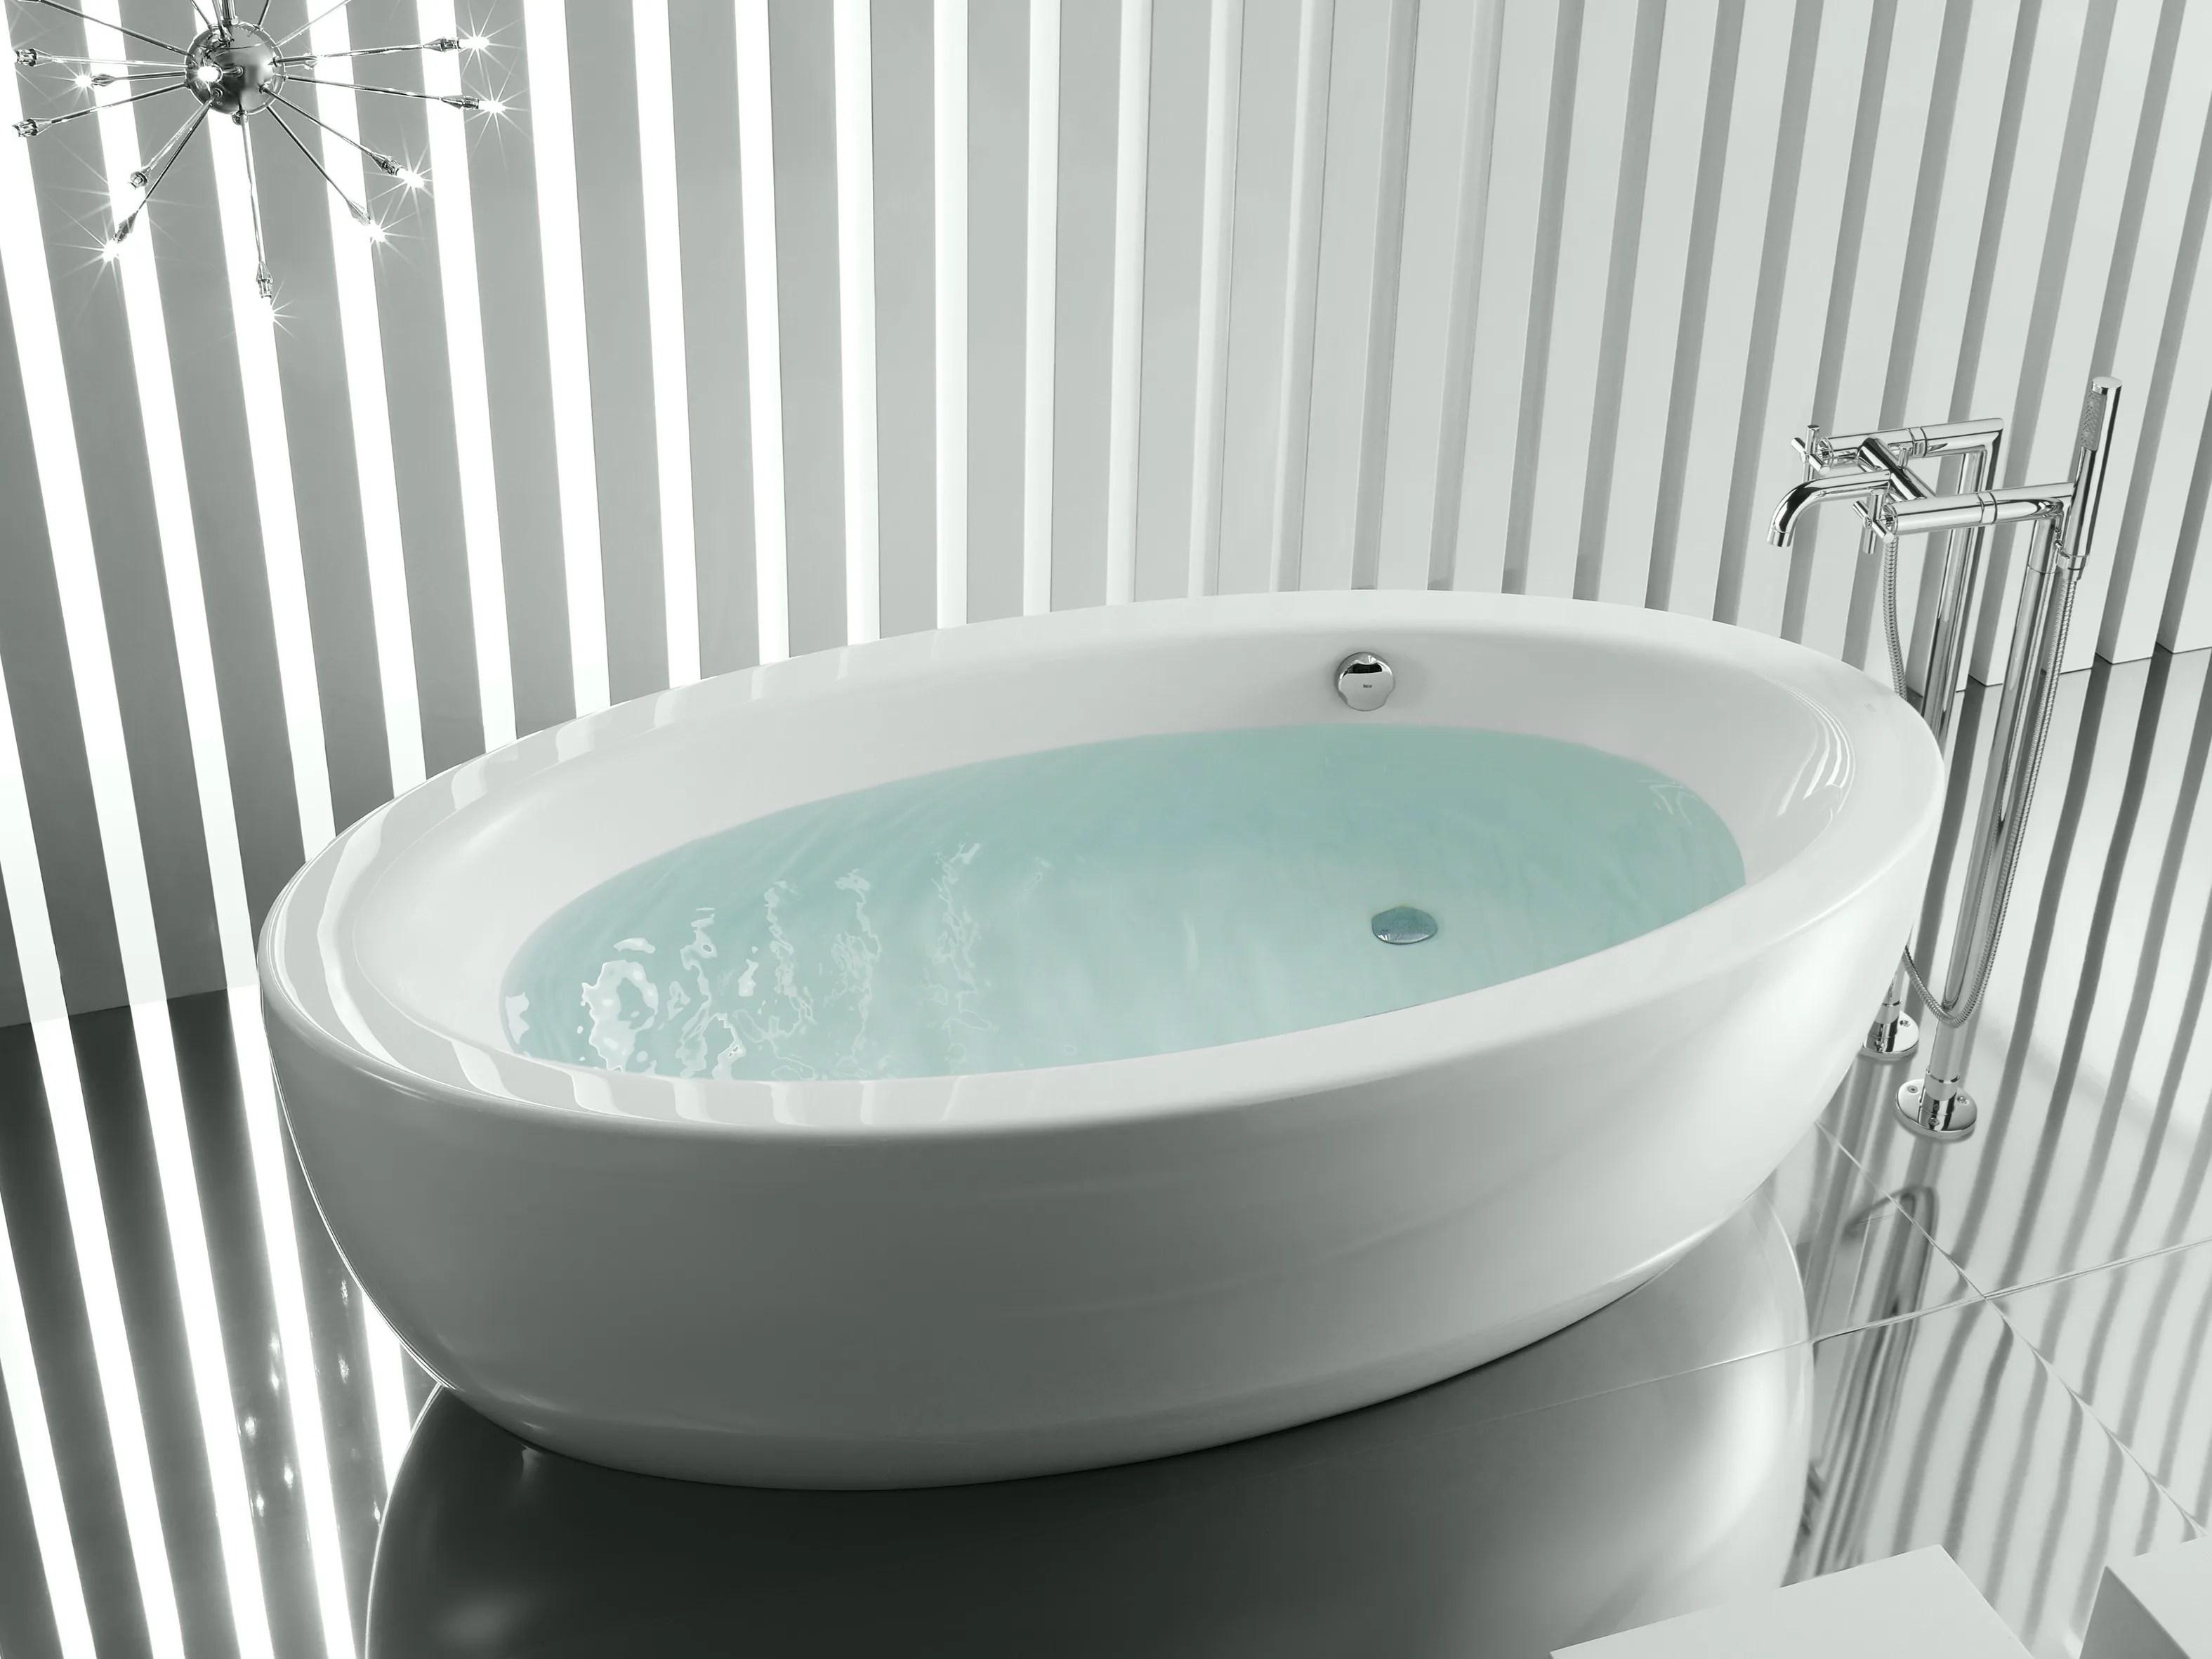 Freestanding Oval Bathtub GEORGIA By ROCA